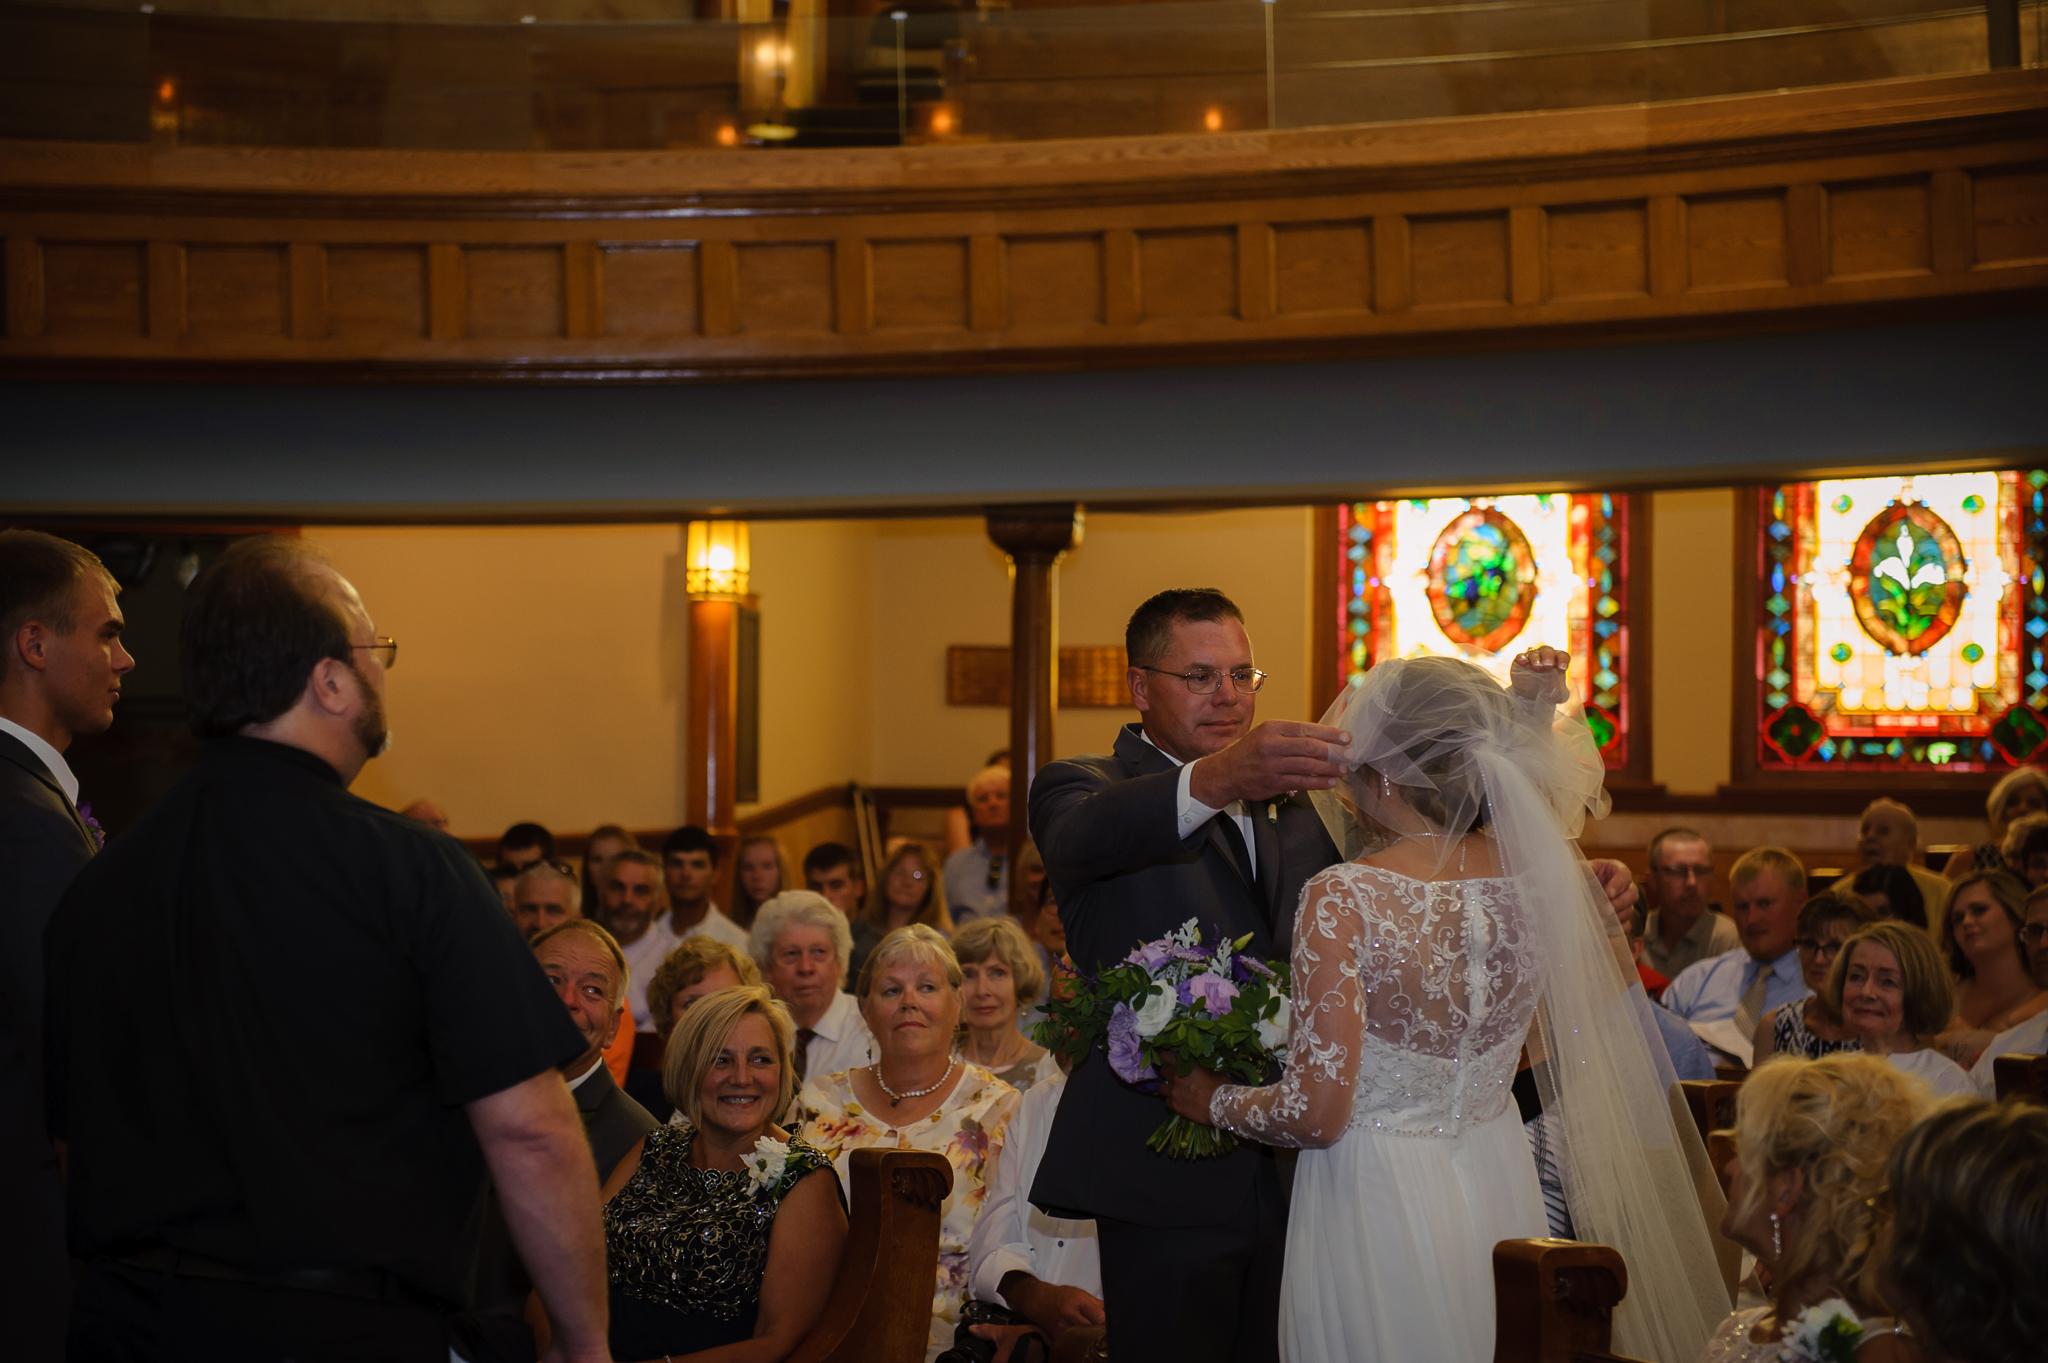 10-ashland washburn wedding photography700_4960.jpg